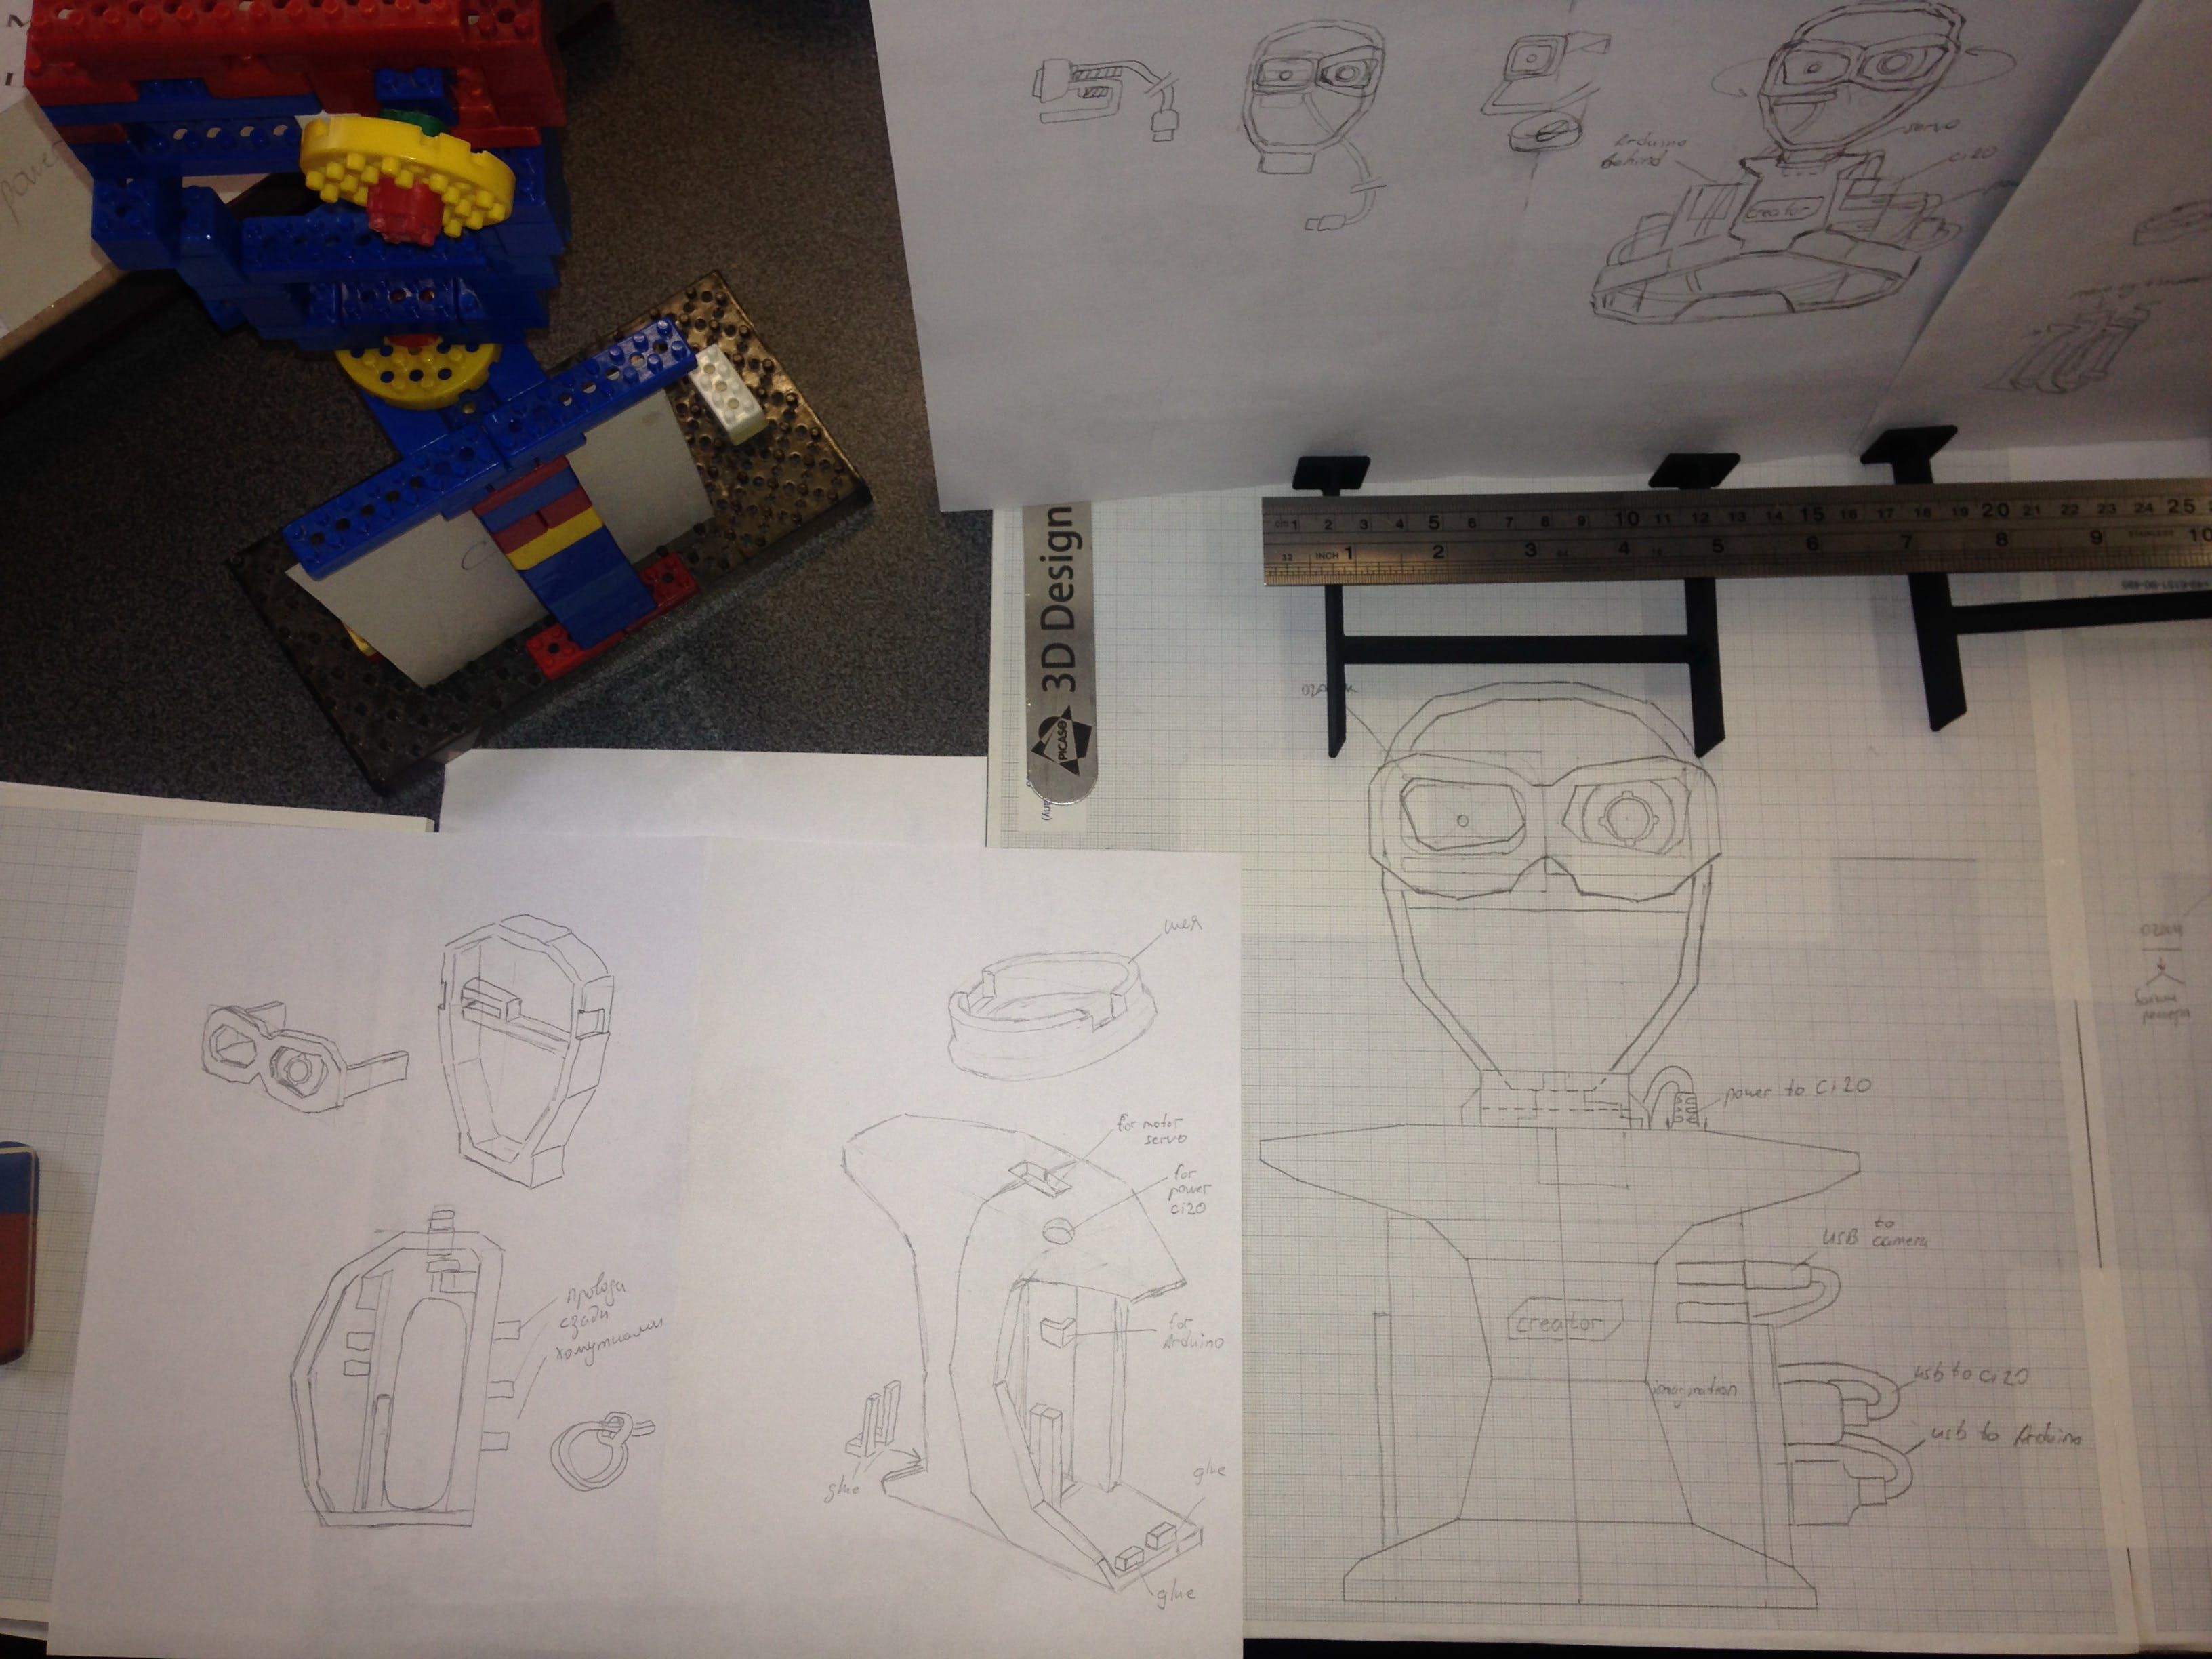 TVS sketches